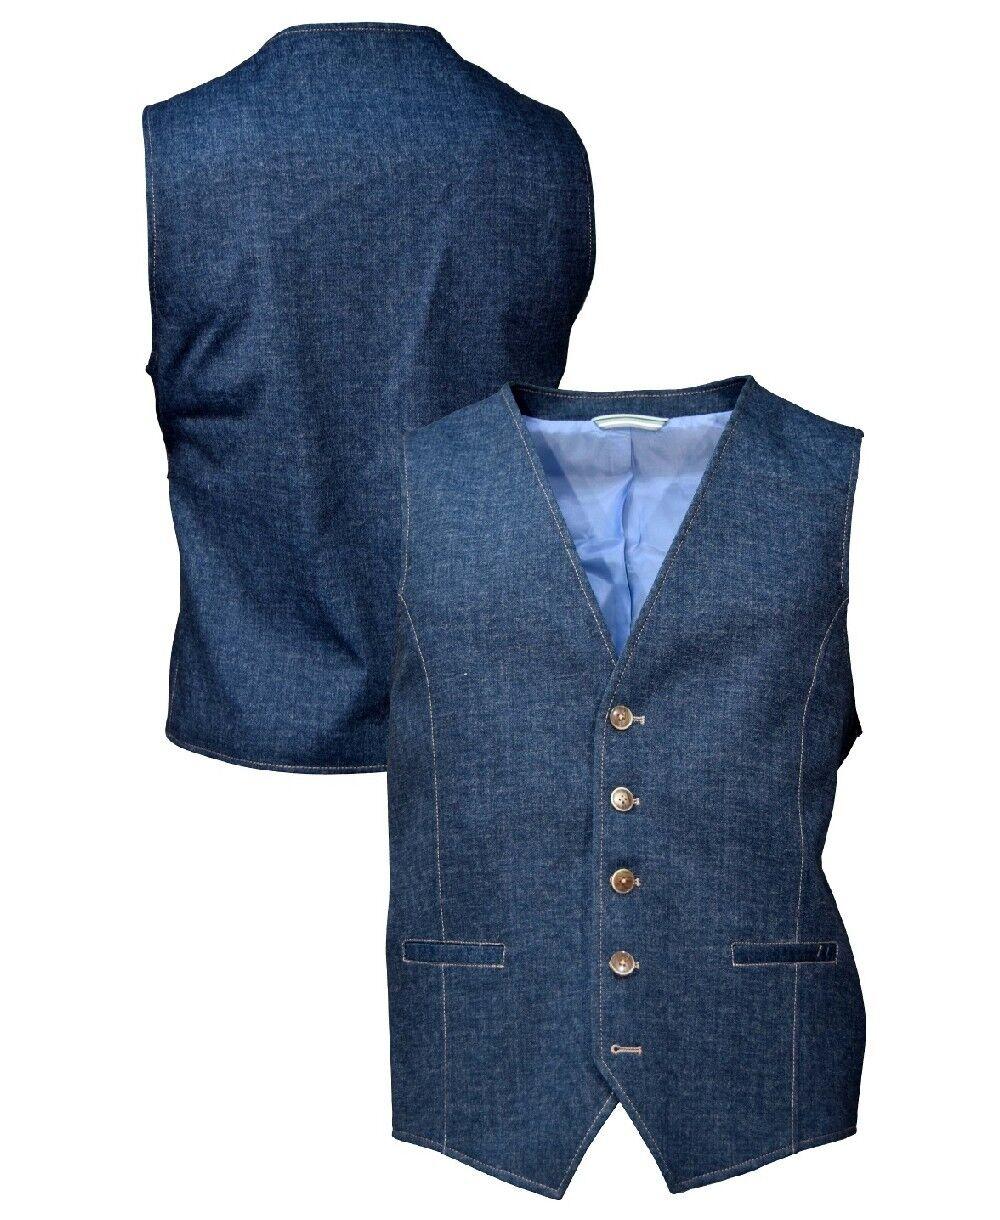 Cabano Modern Fit Stretch Anzug Weste Camouflage Print blau Gr. 50 bis 62